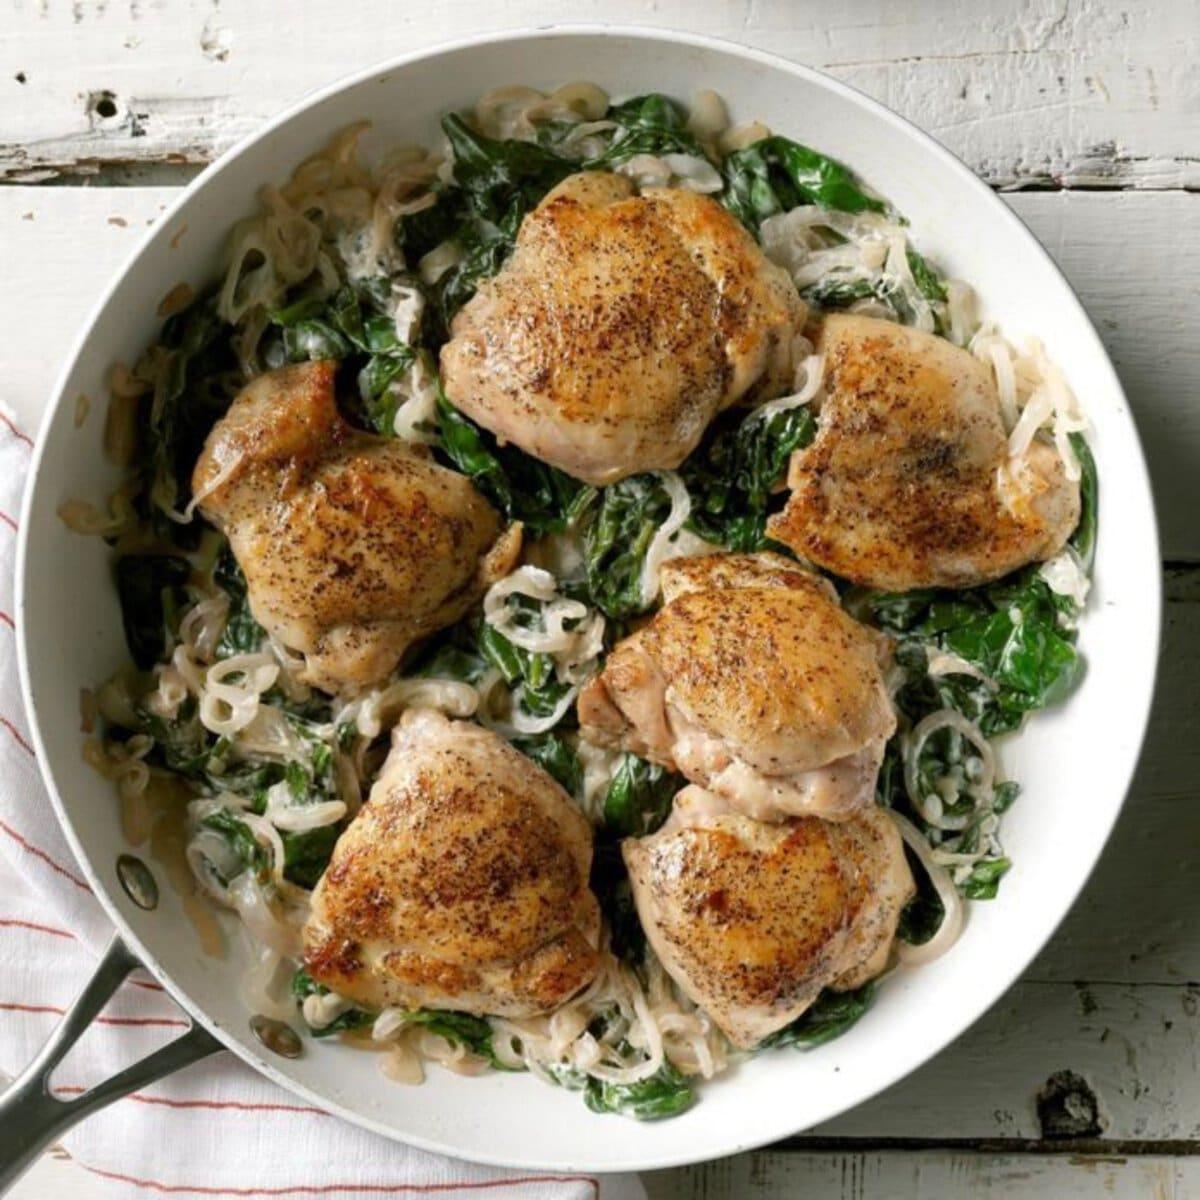 Chicken thighs on spinach in skillet